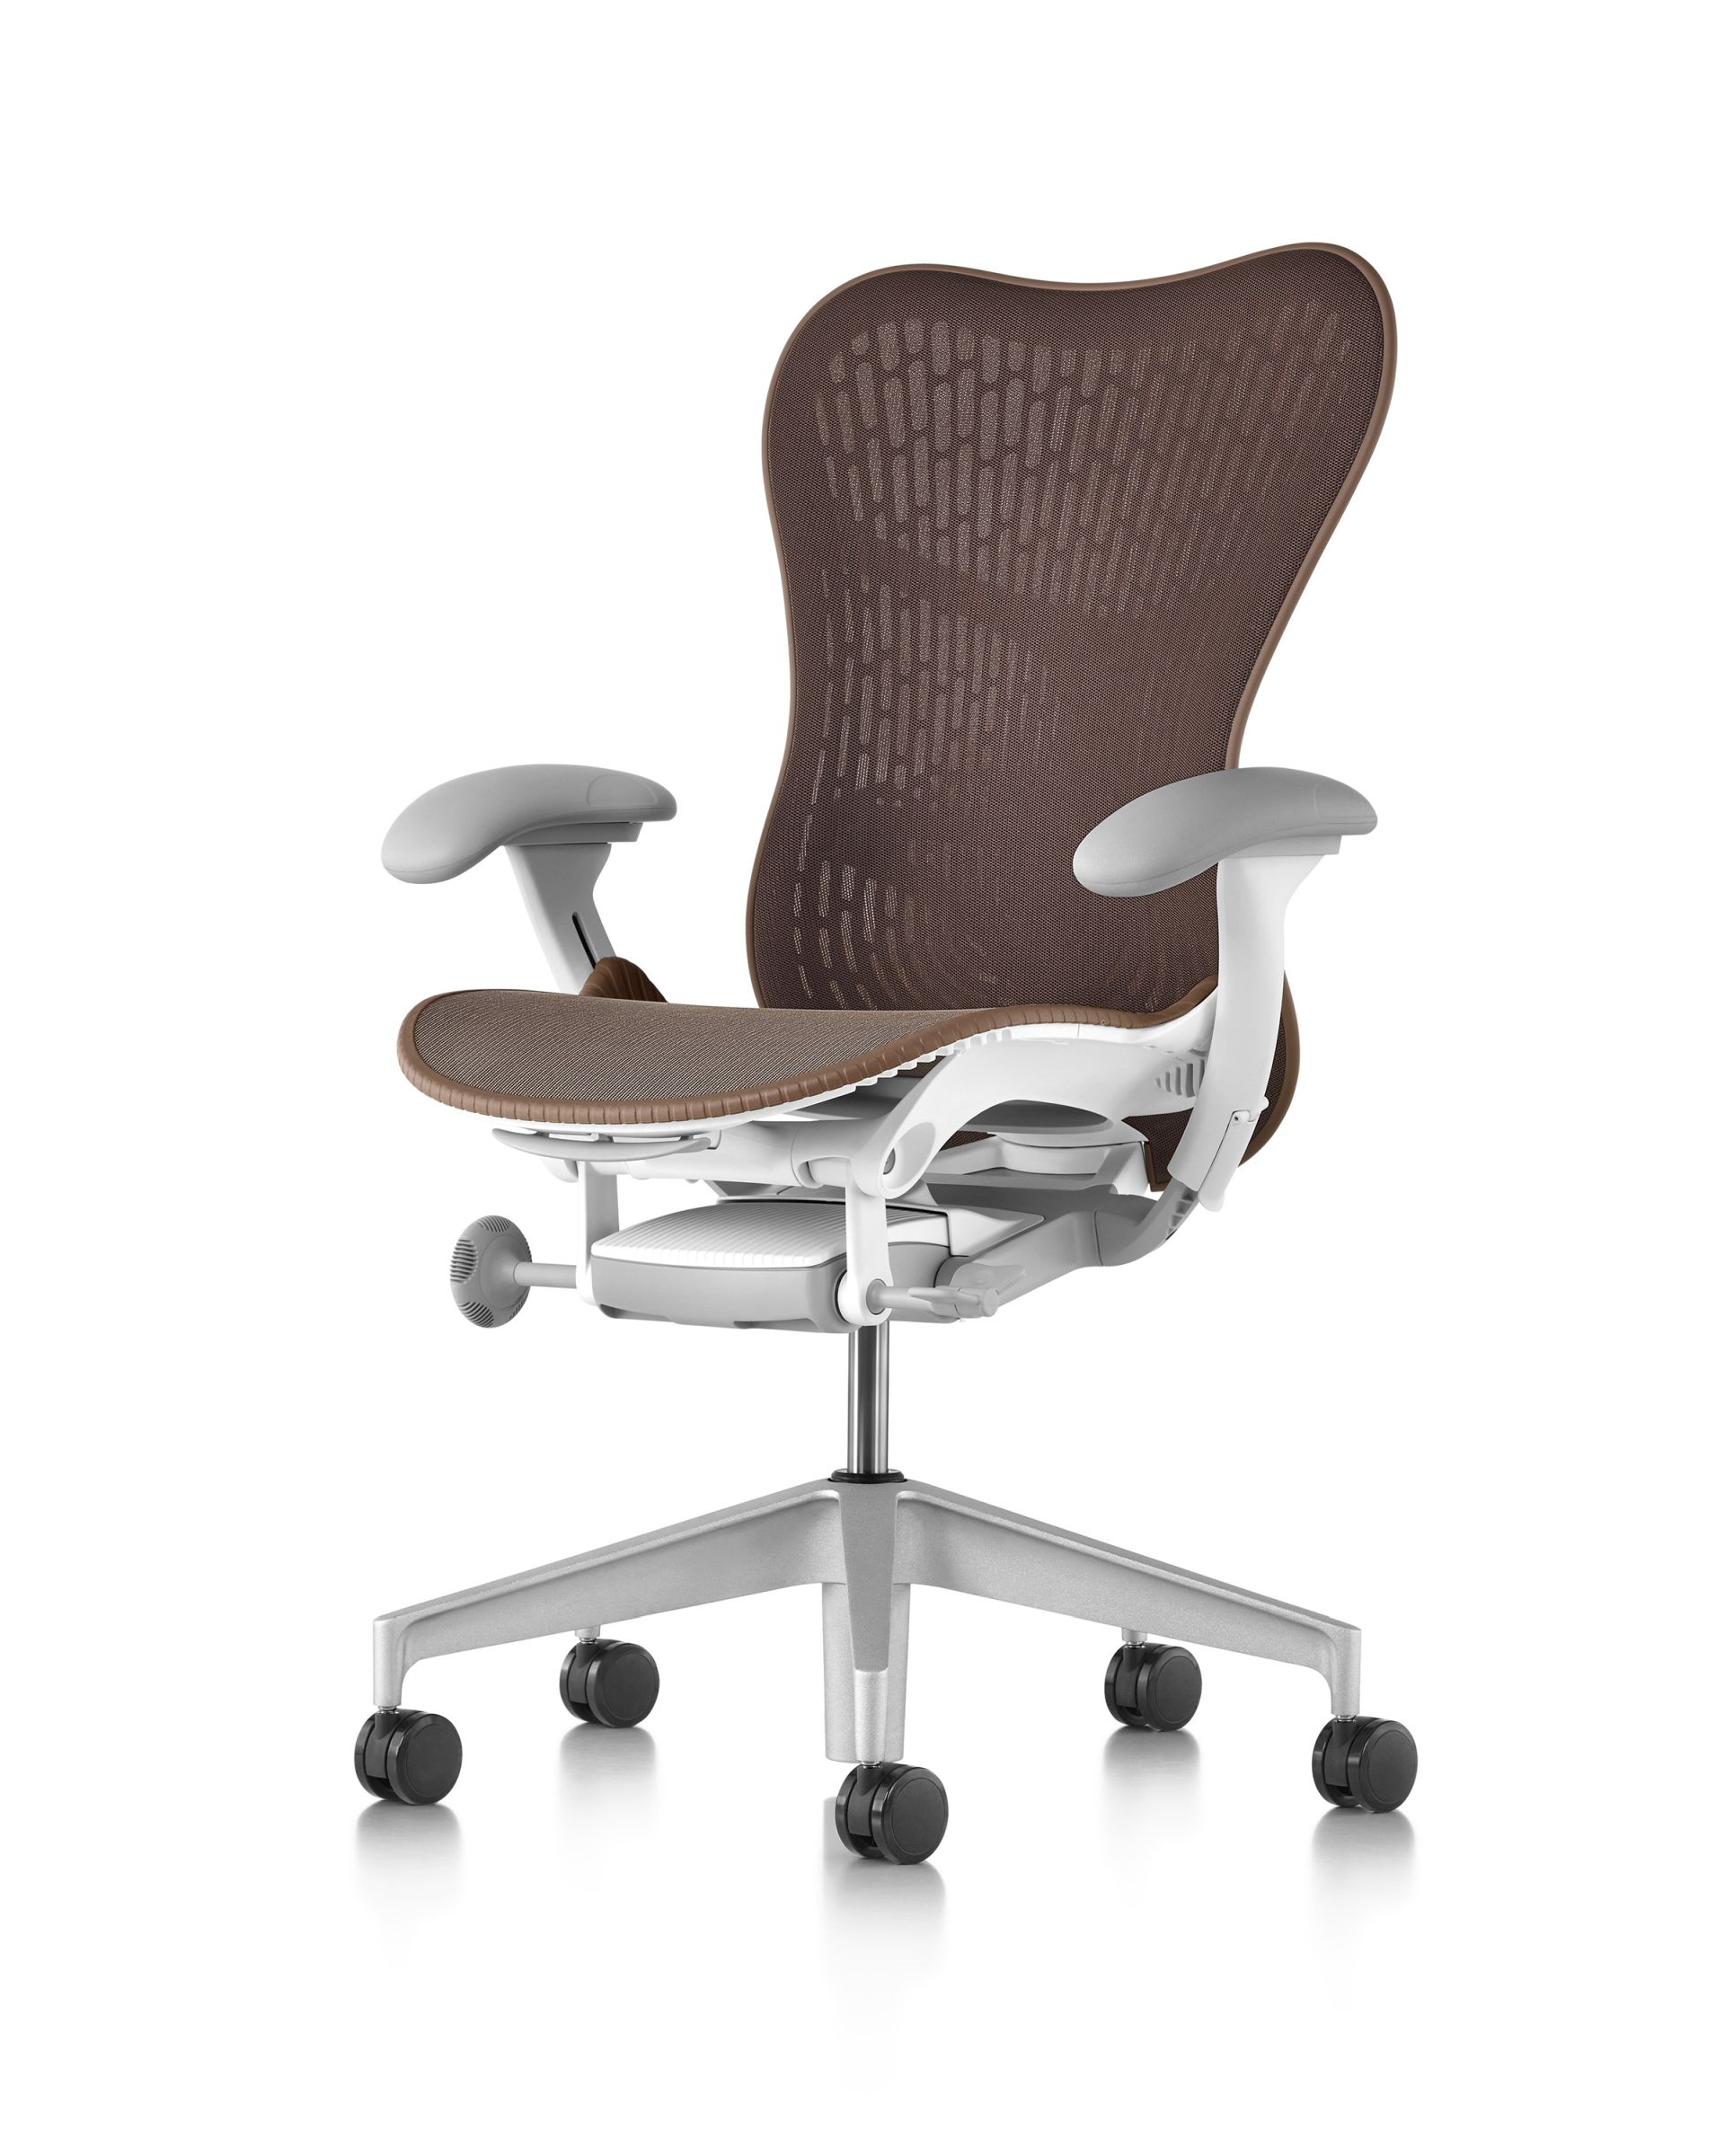 mirra 2 chair baby shower rental brooklyn chairs love that design